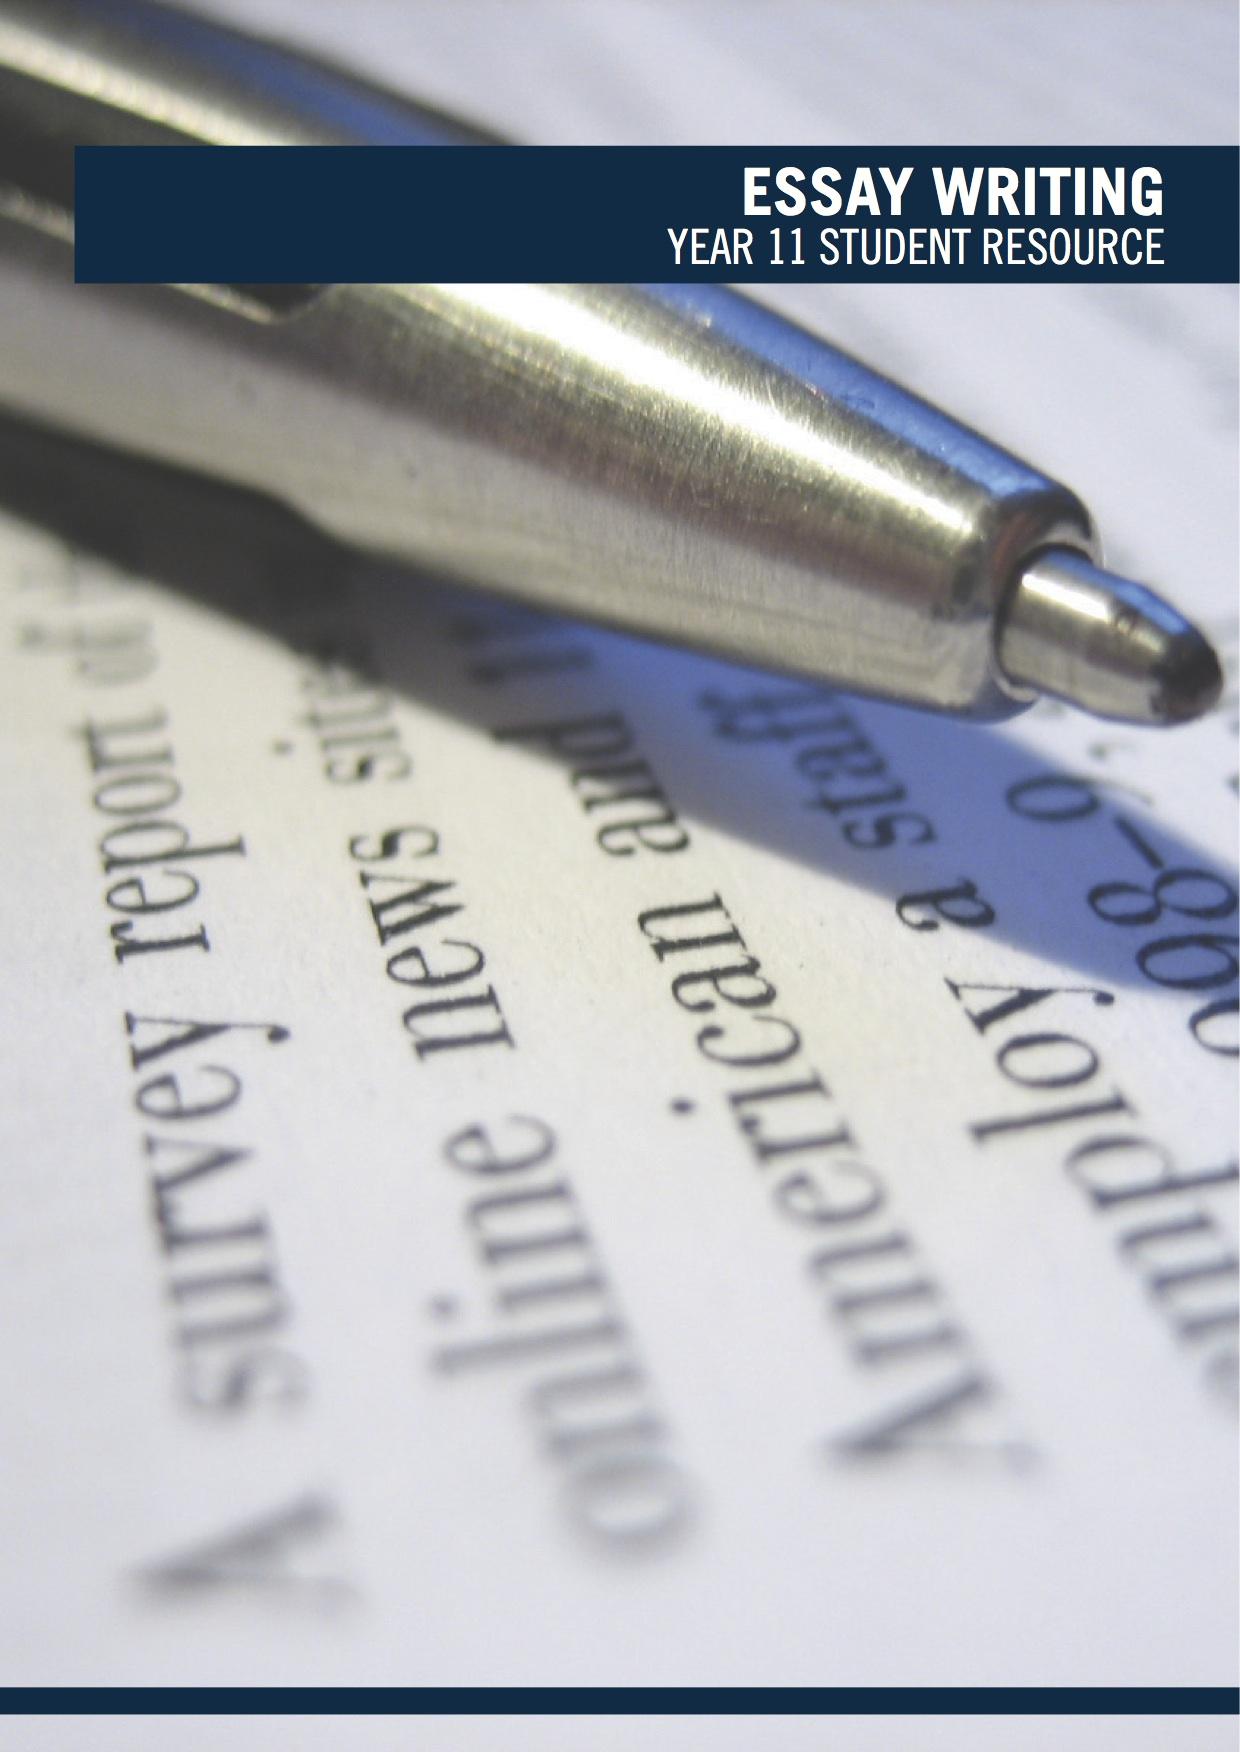 Buy resume for writing skills